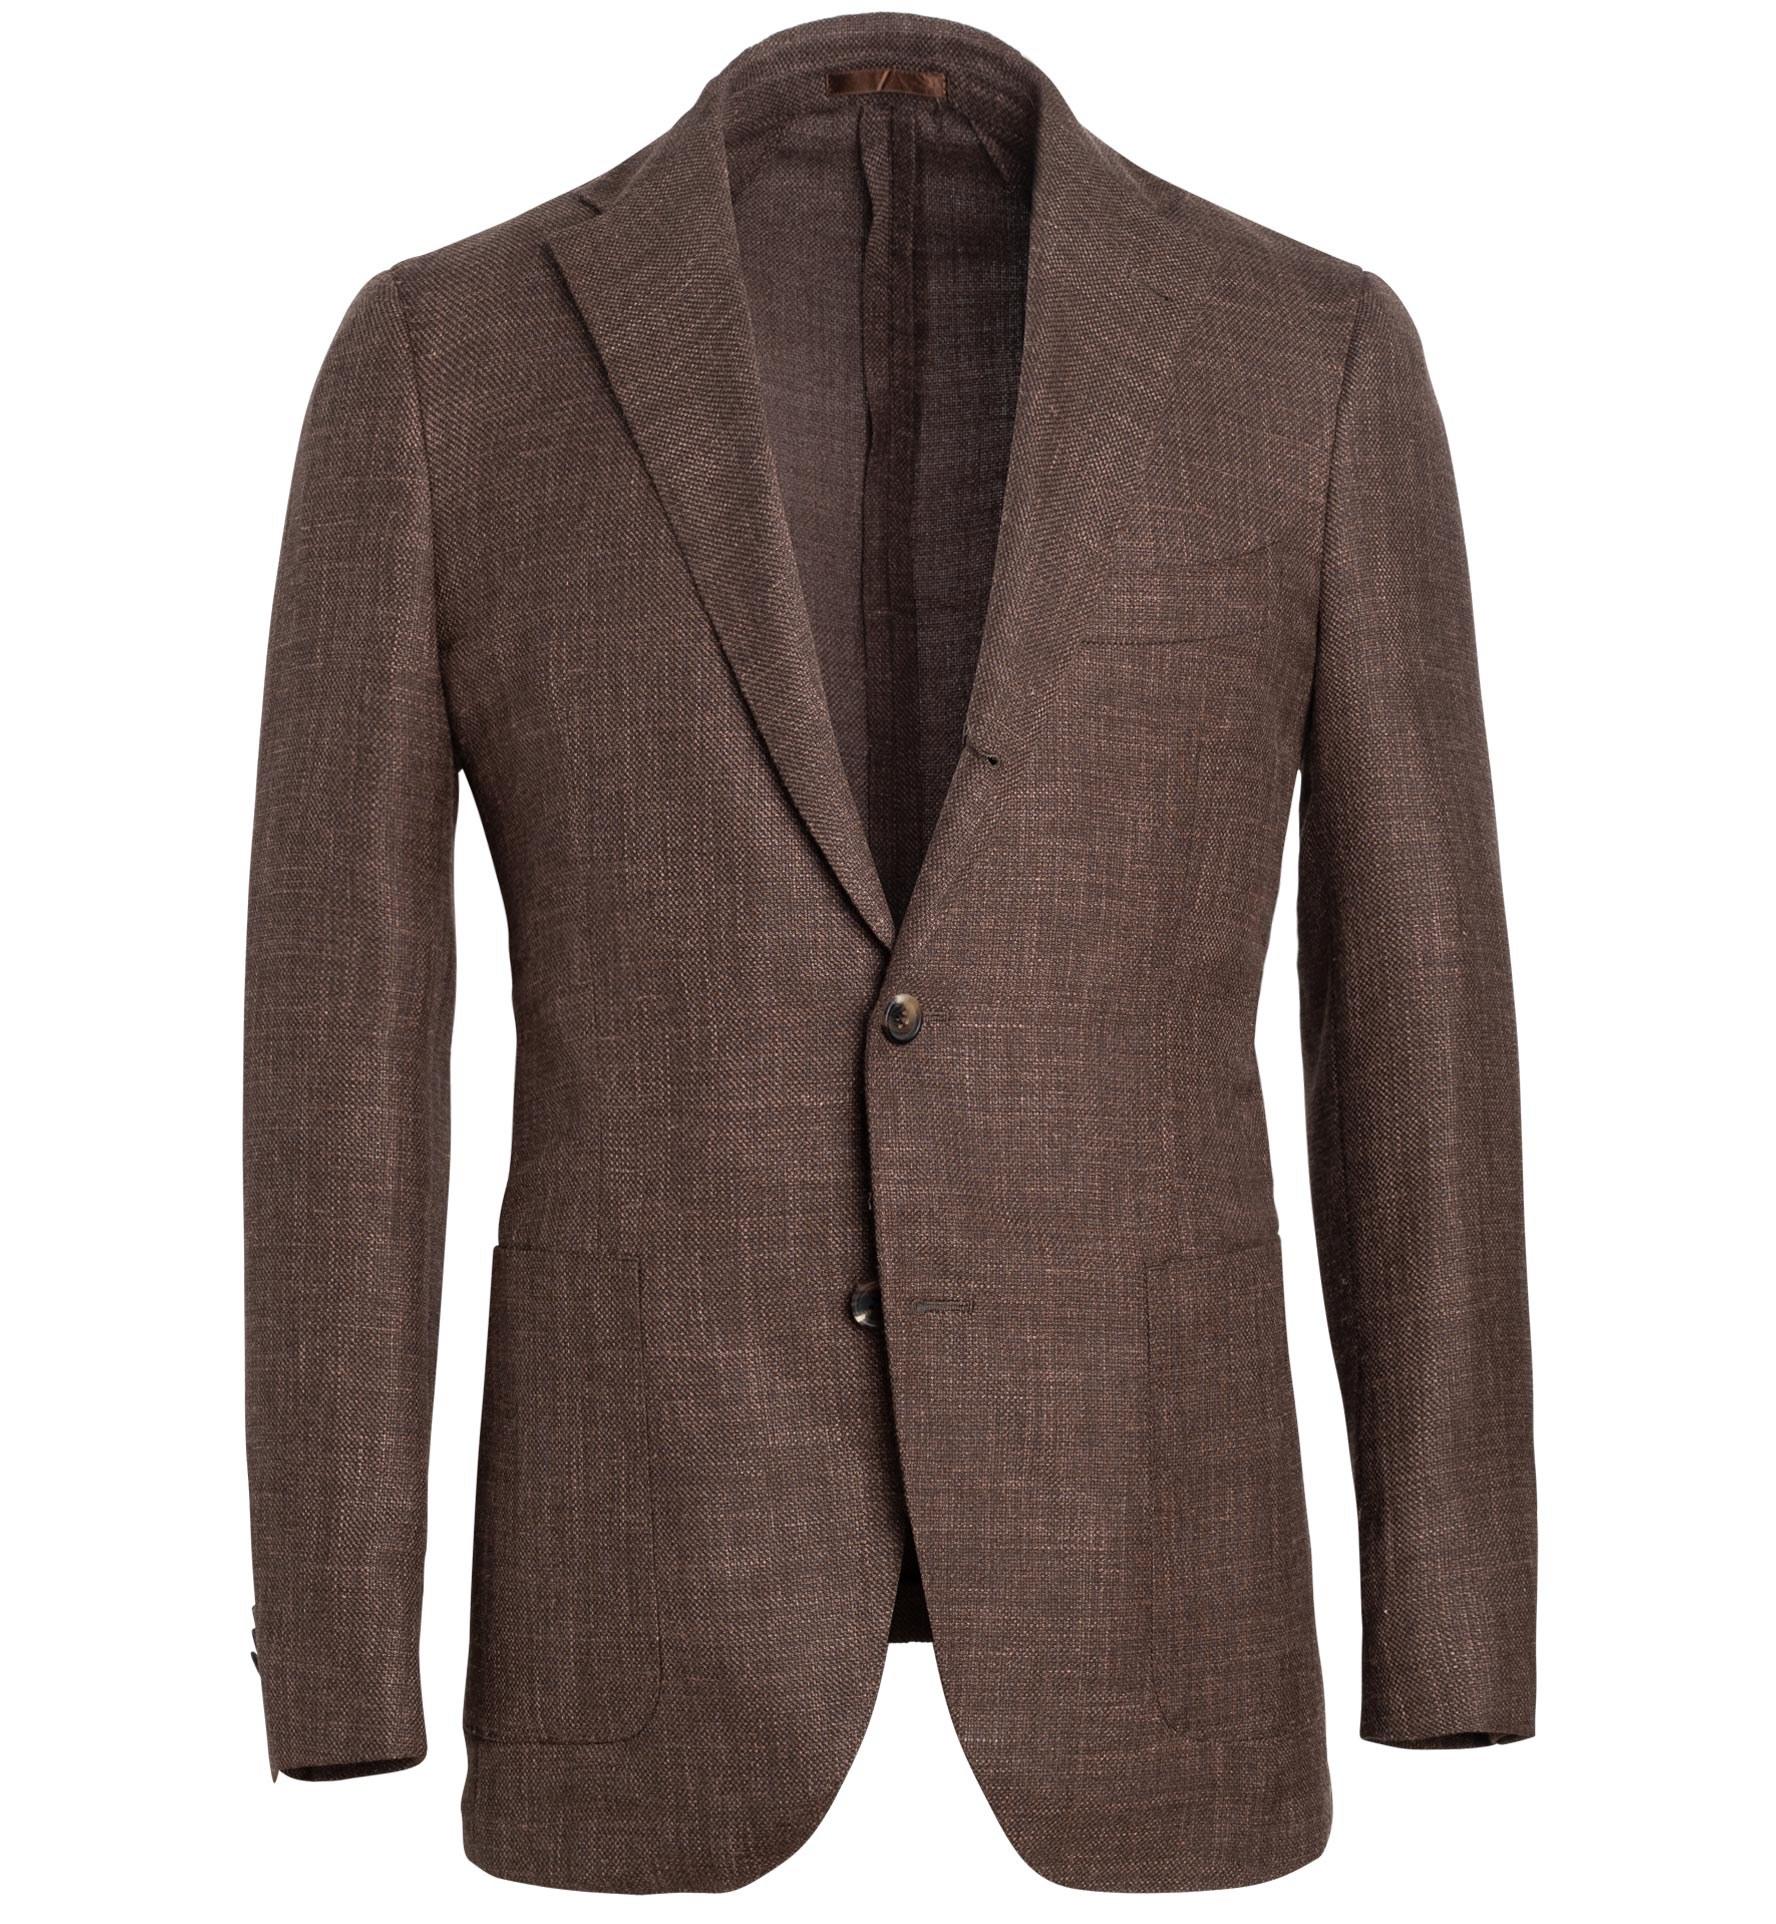 Zoom Image of Bedford Tobacco Wool Blend Hopsack Jacket